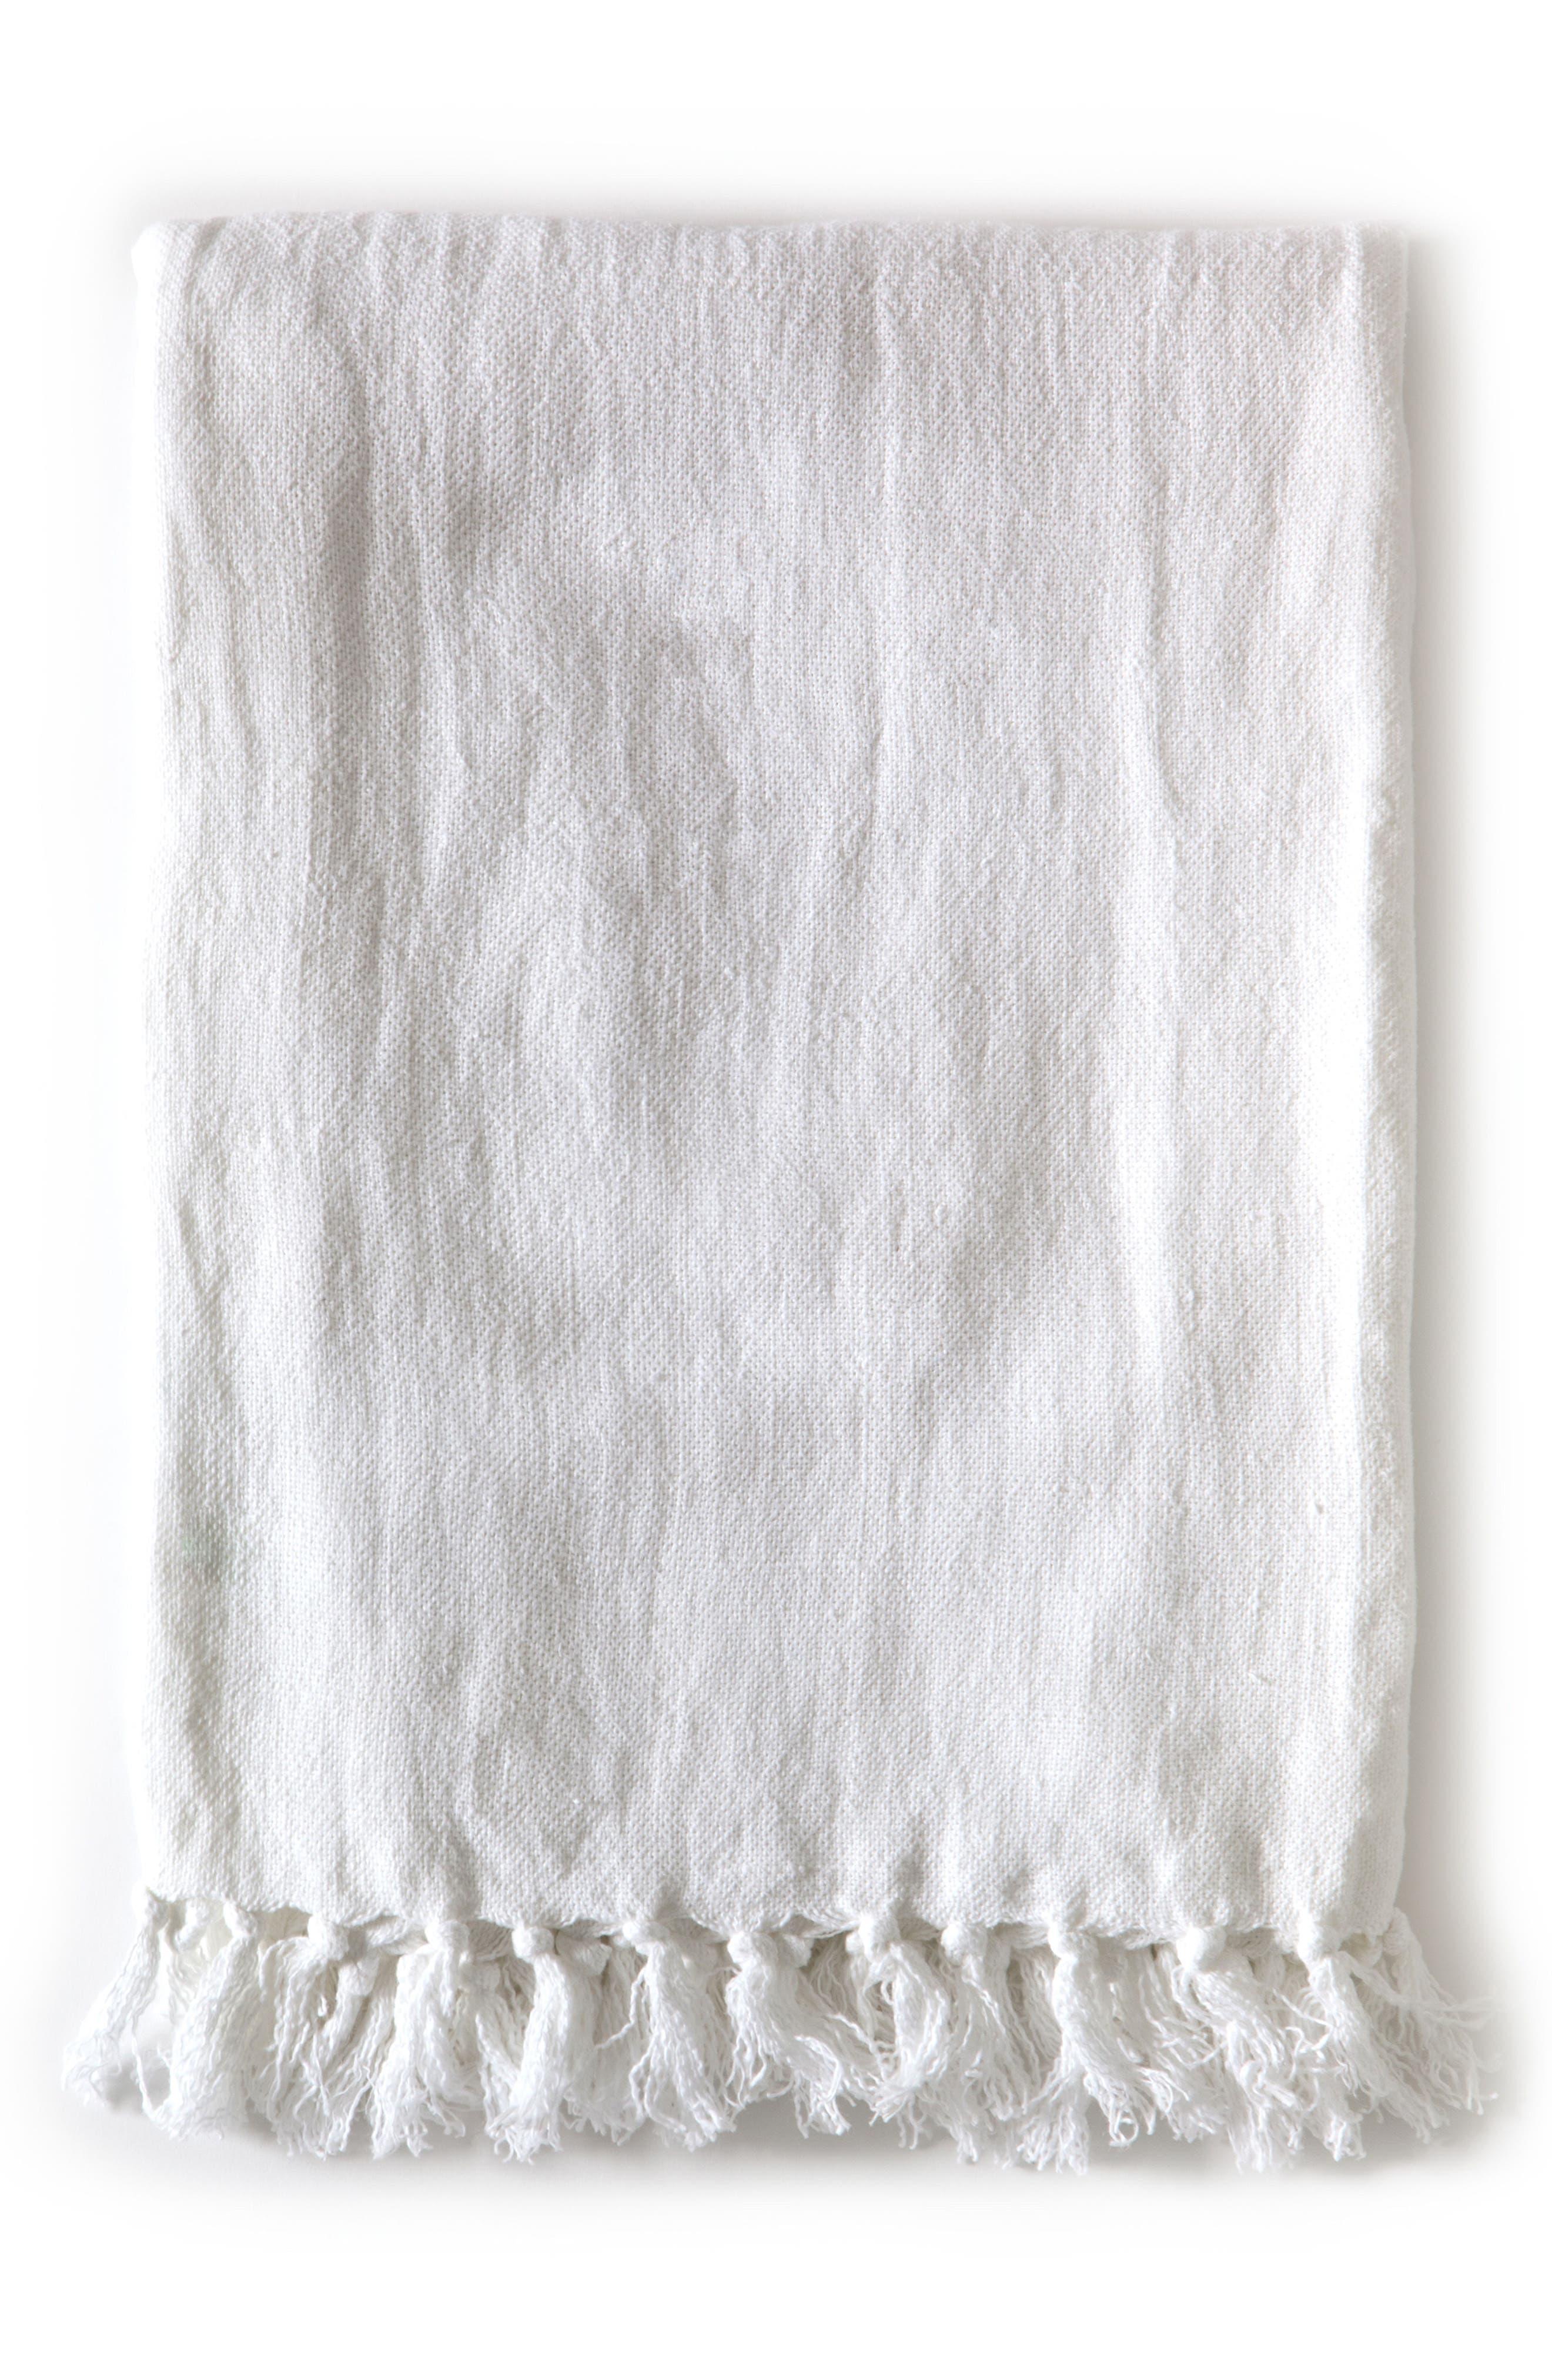 POM POM AT HOME Montauk Throw Blanket, Main, color, WHITE